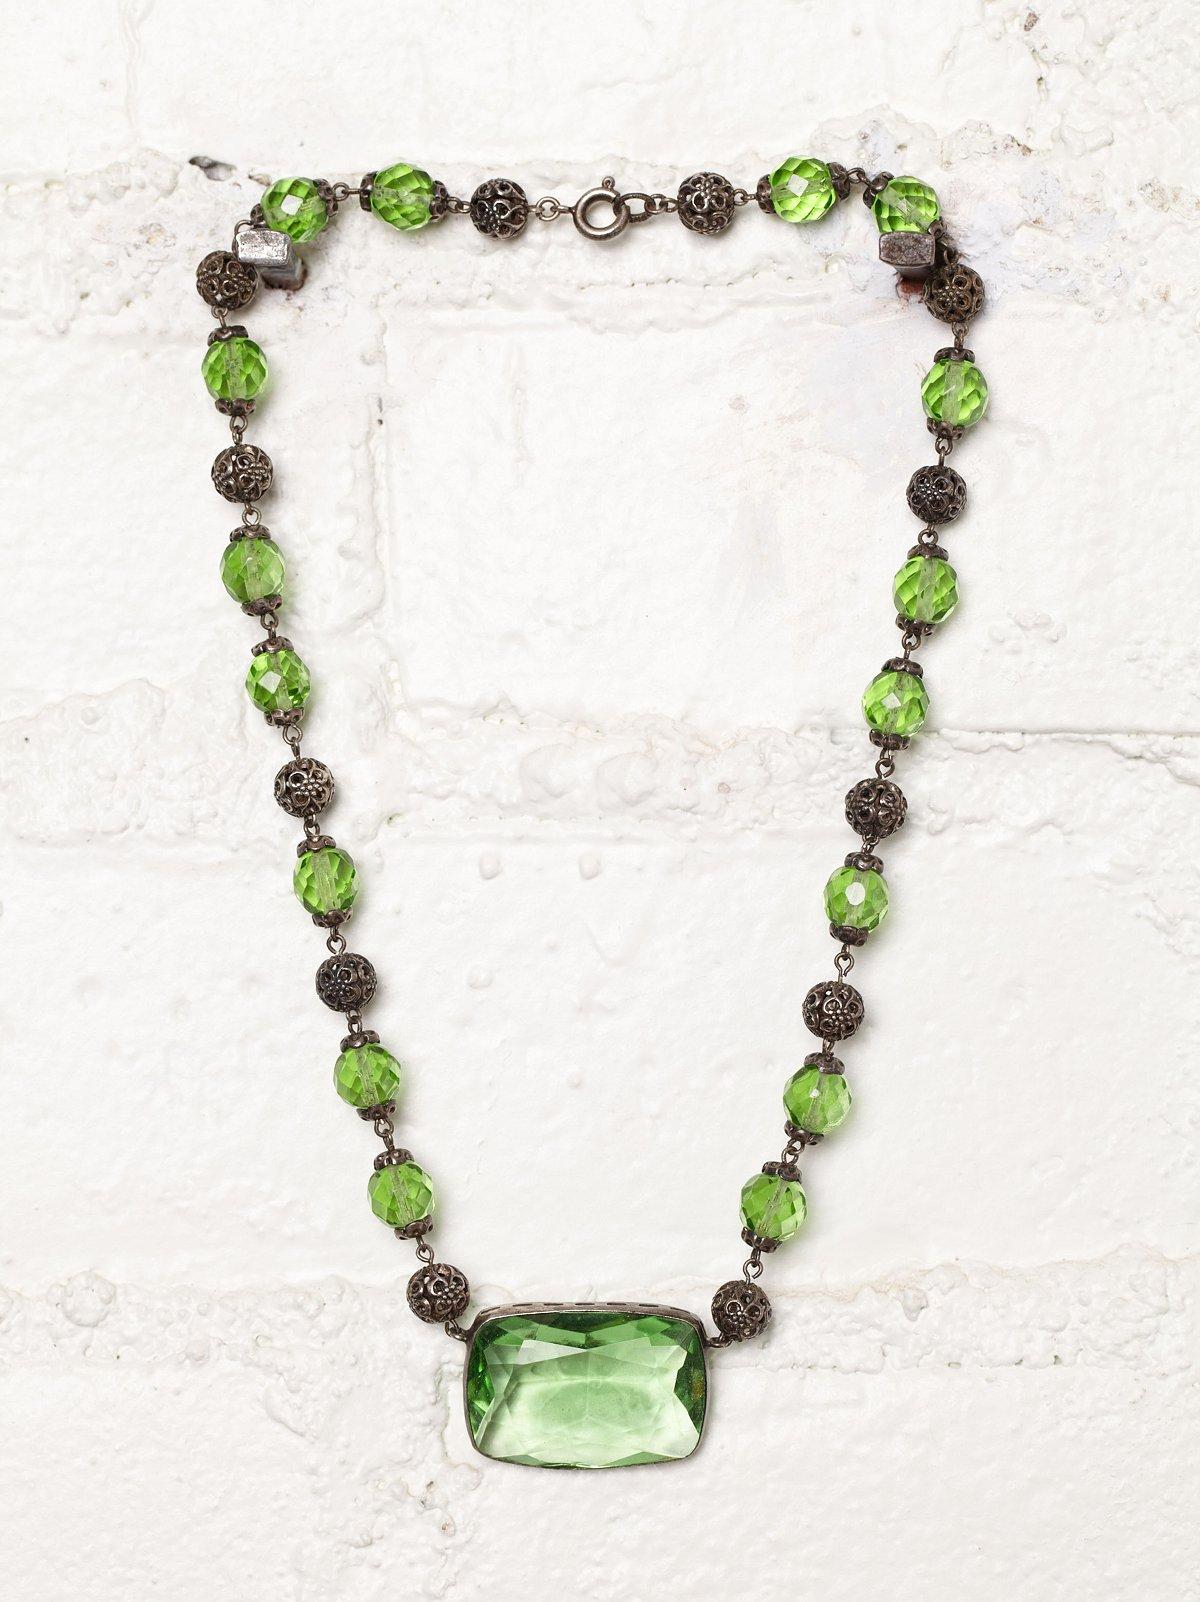 Vintage Green Czechoslovakian Crystal Necklace